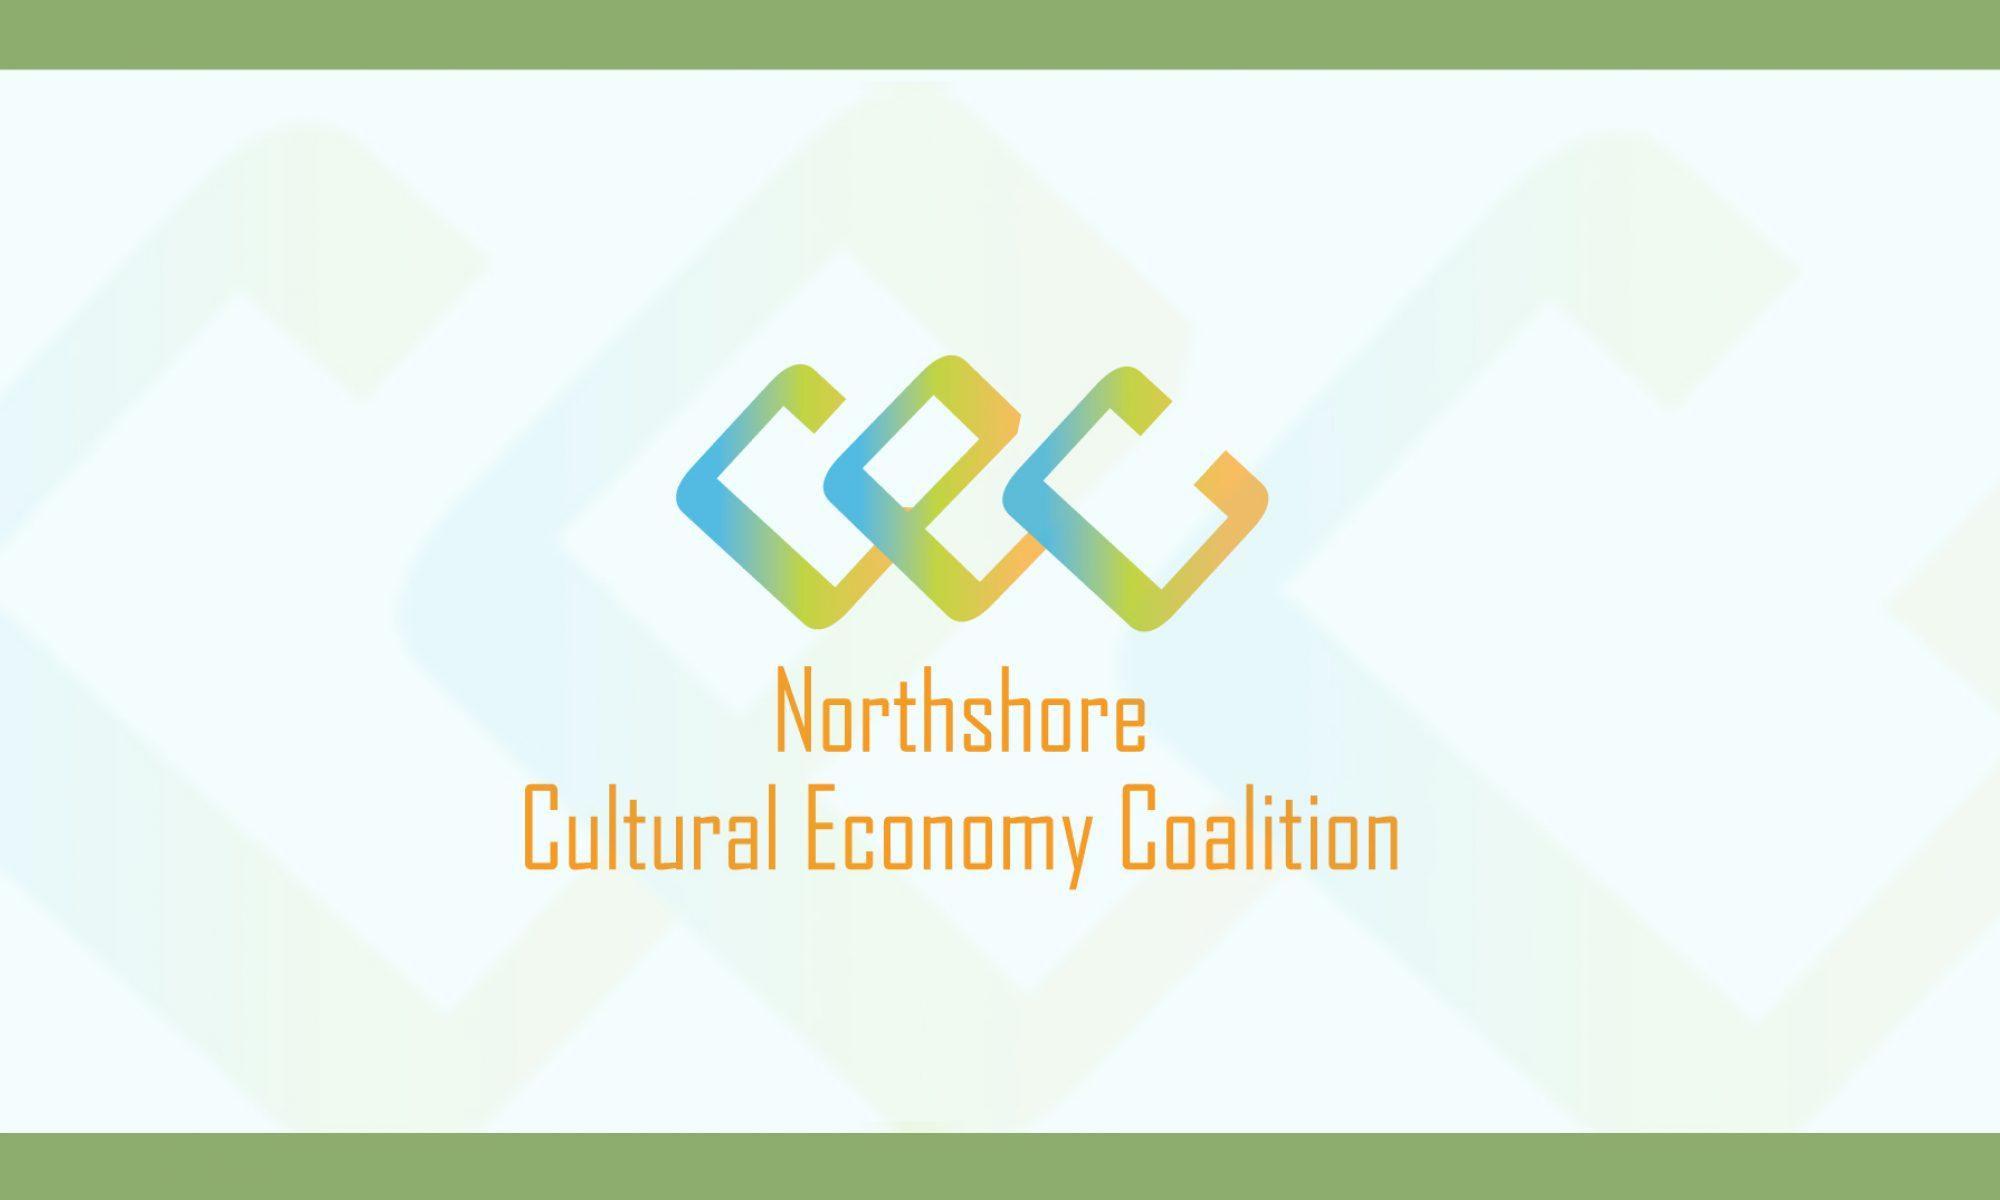 Northshore Cultural Economy Coalition